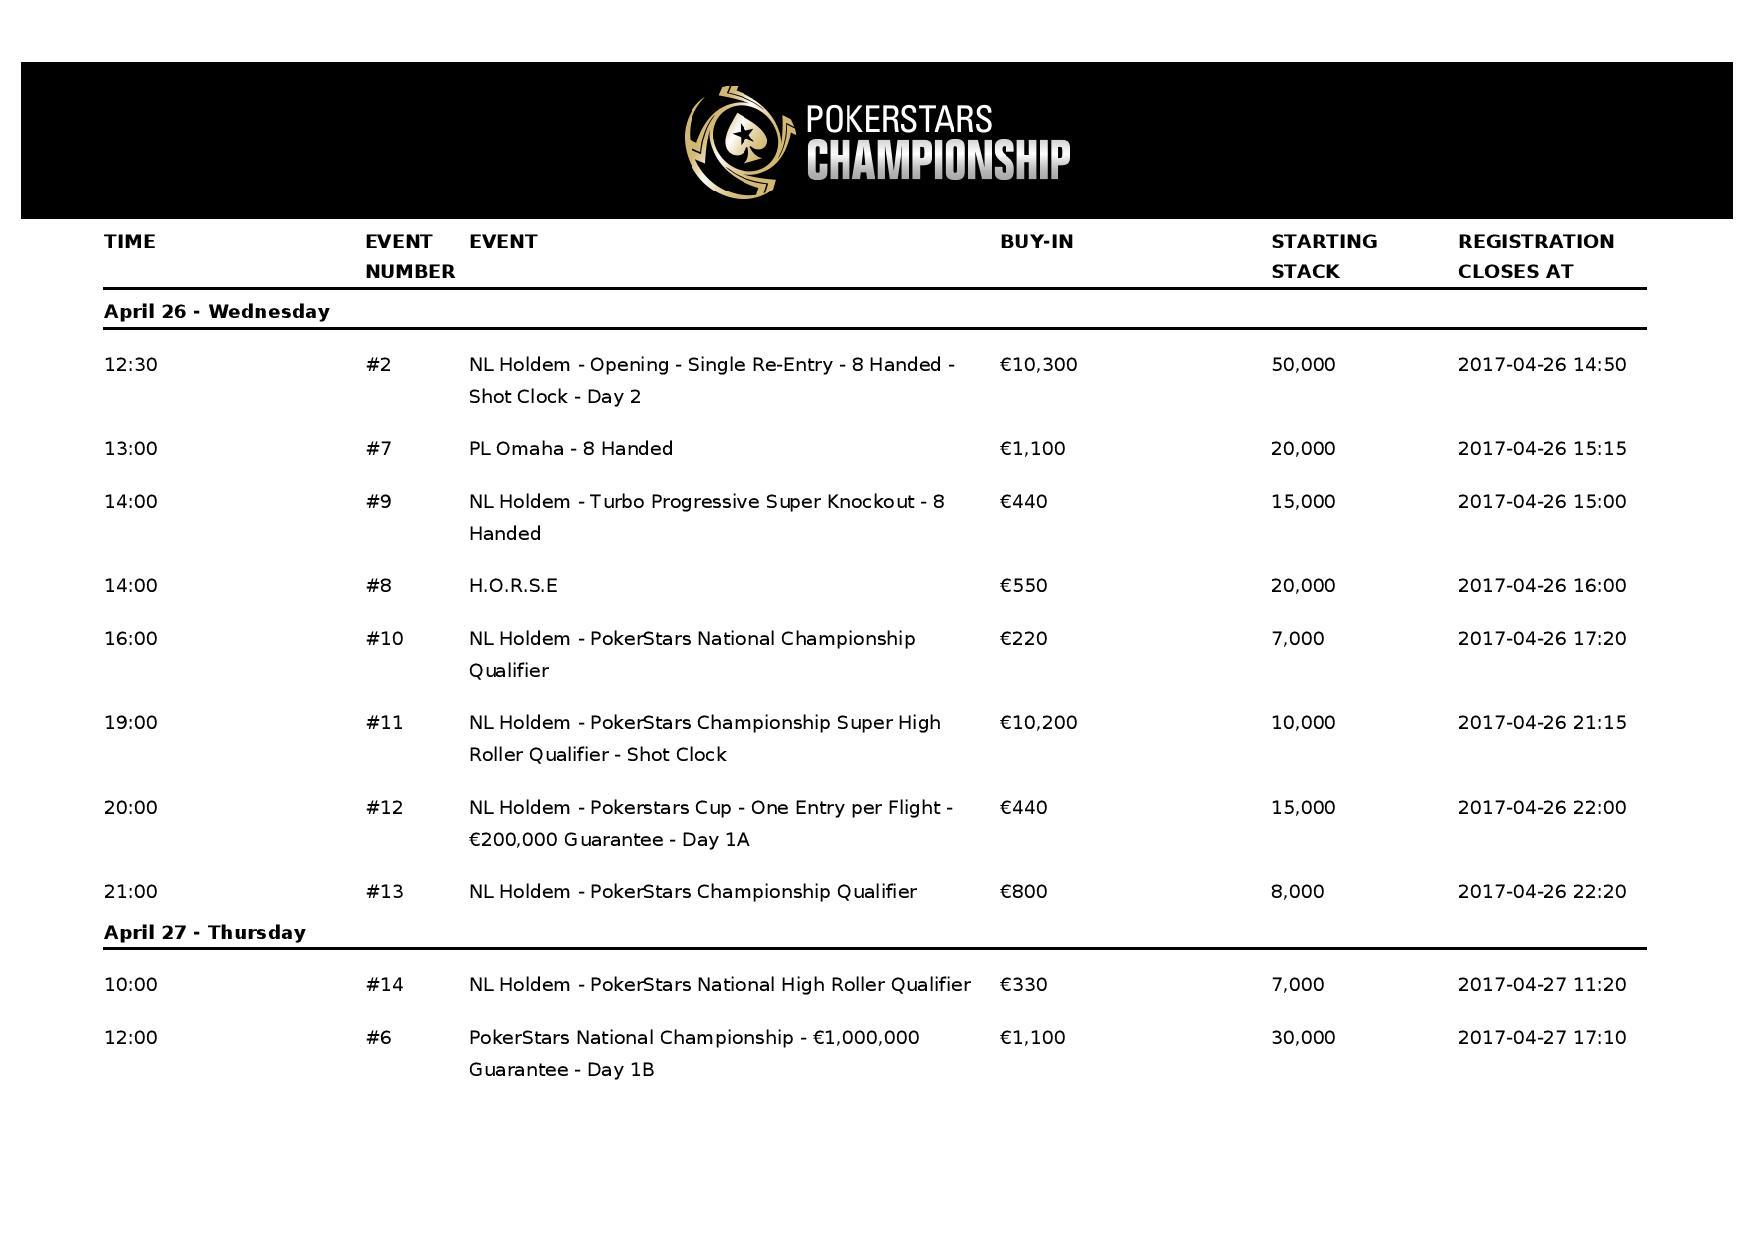 PokerStarsChampionship2017_Monaco_Schedule[1] Copy-page-002